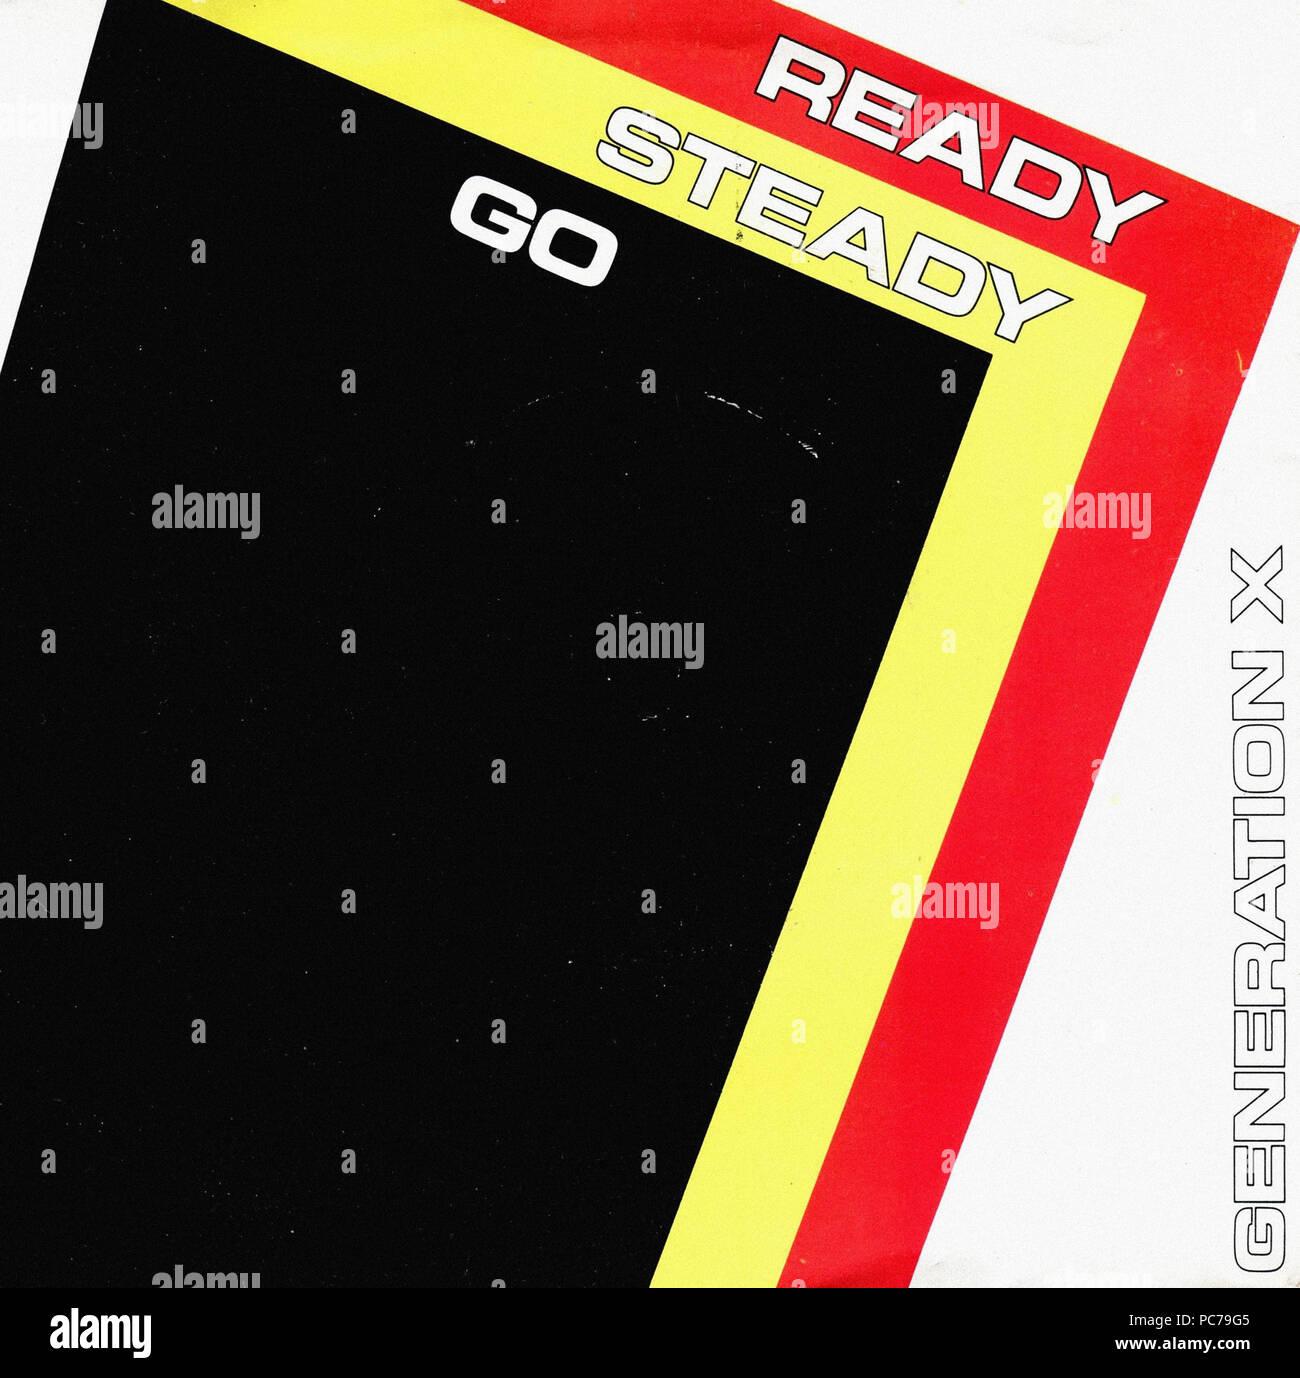 Generation X   -  Ready Steady Go (1978)  -  Vintage vinyl album cover - Stock Image